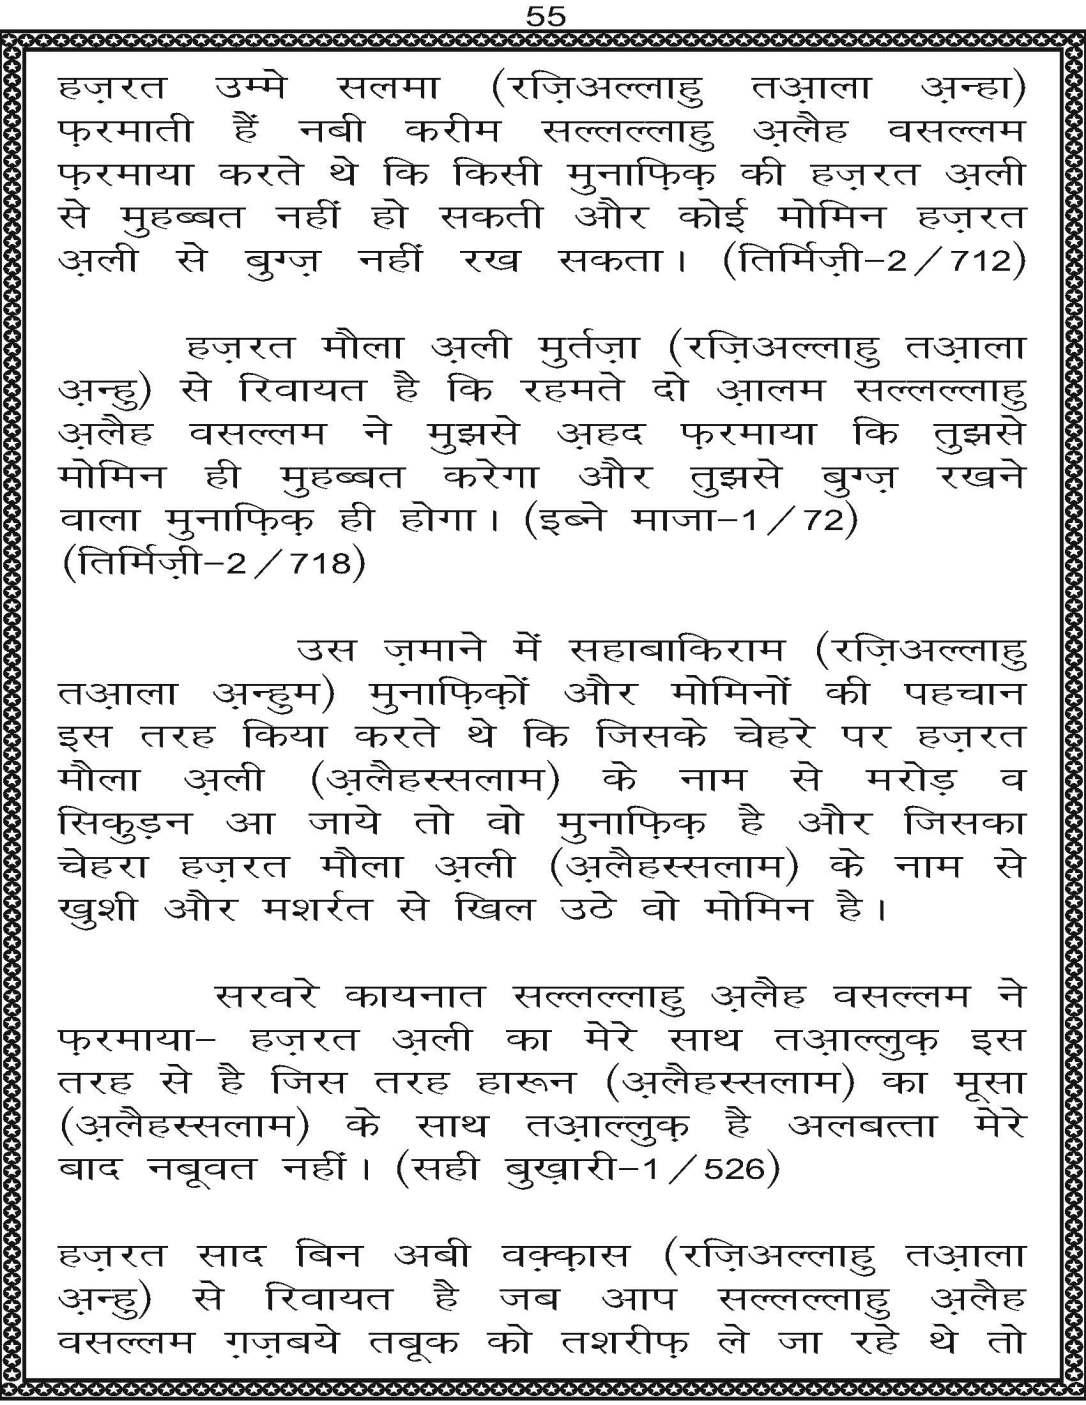 AzmateTaziyadari_Page_055